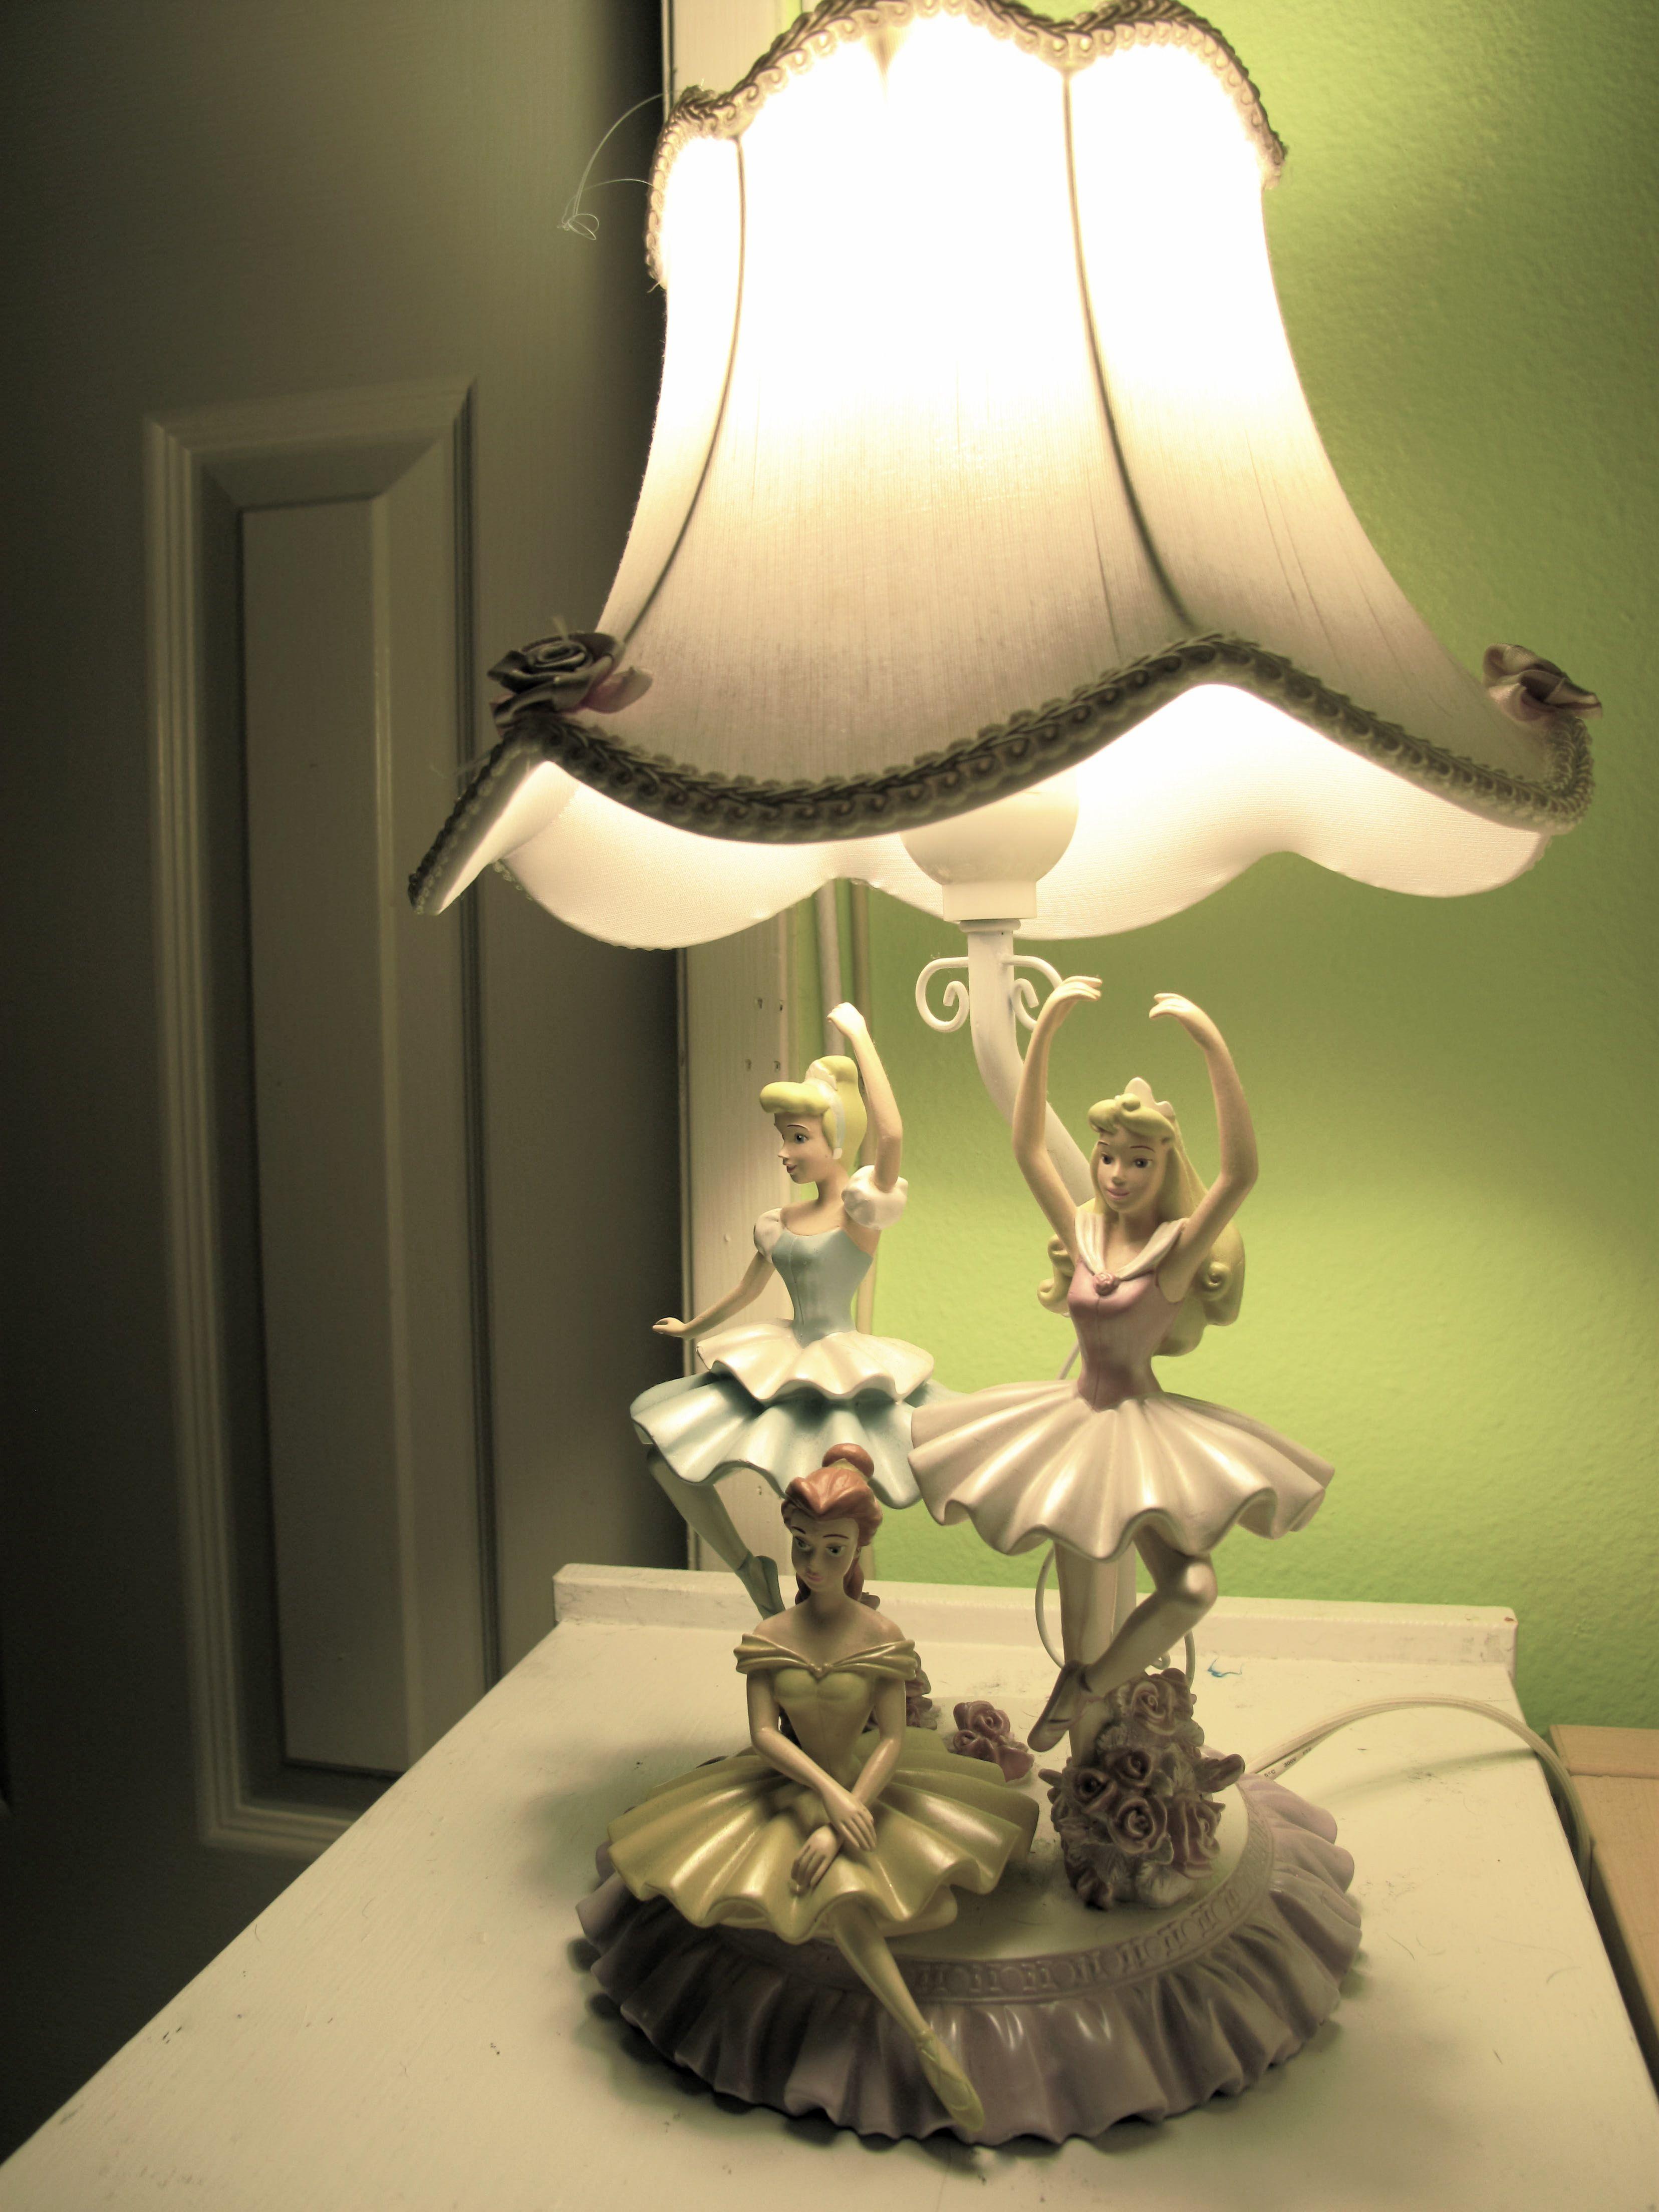 Disney Princess Ballerina Lamp - Cinderella, Belle, Aurora | From ...